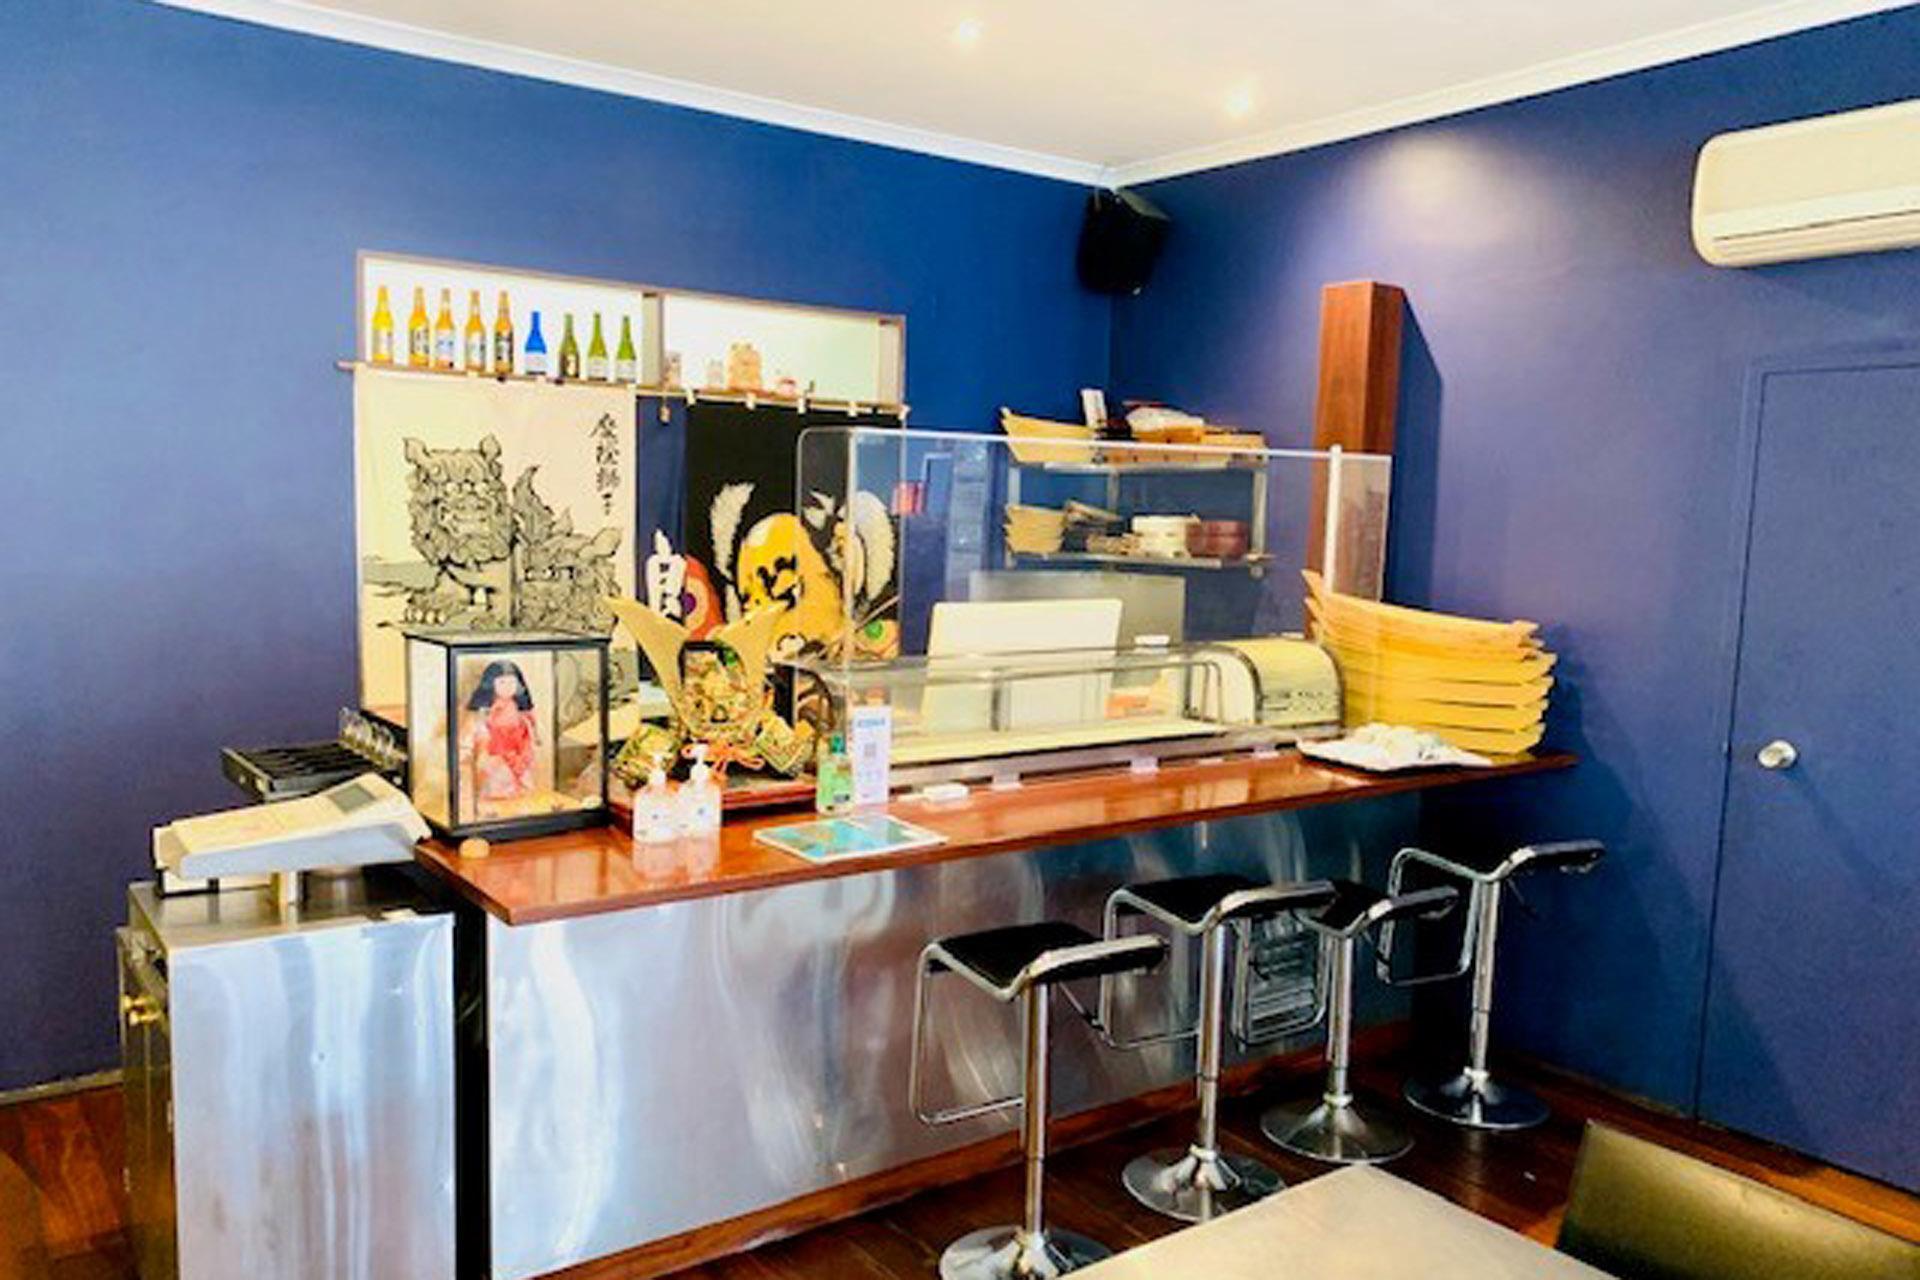 g - Jirochyo Japanese Bar & Restaurant